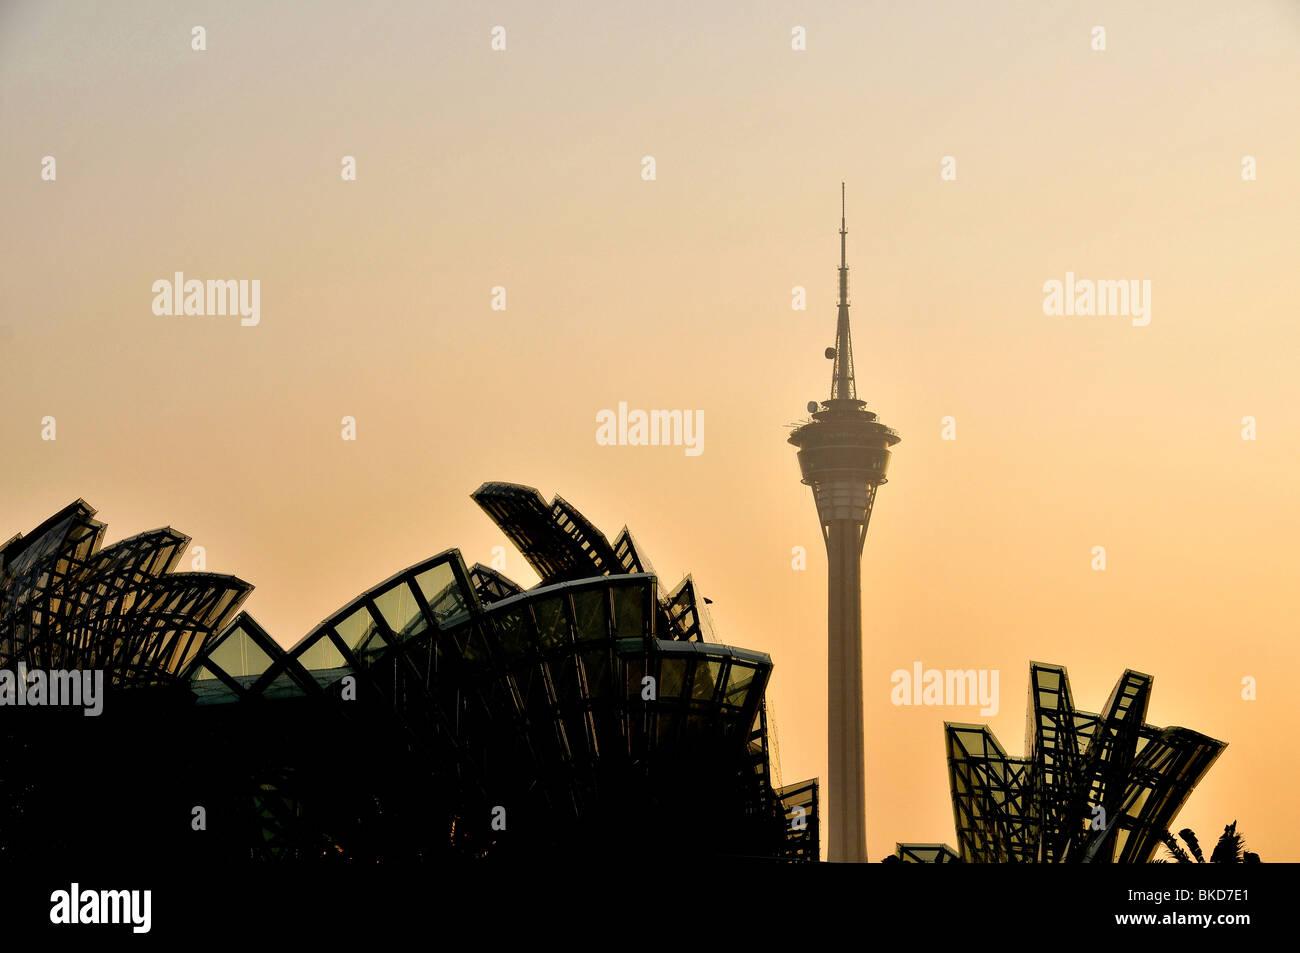 Torre panorámica, Macao, China Imagen De Stock